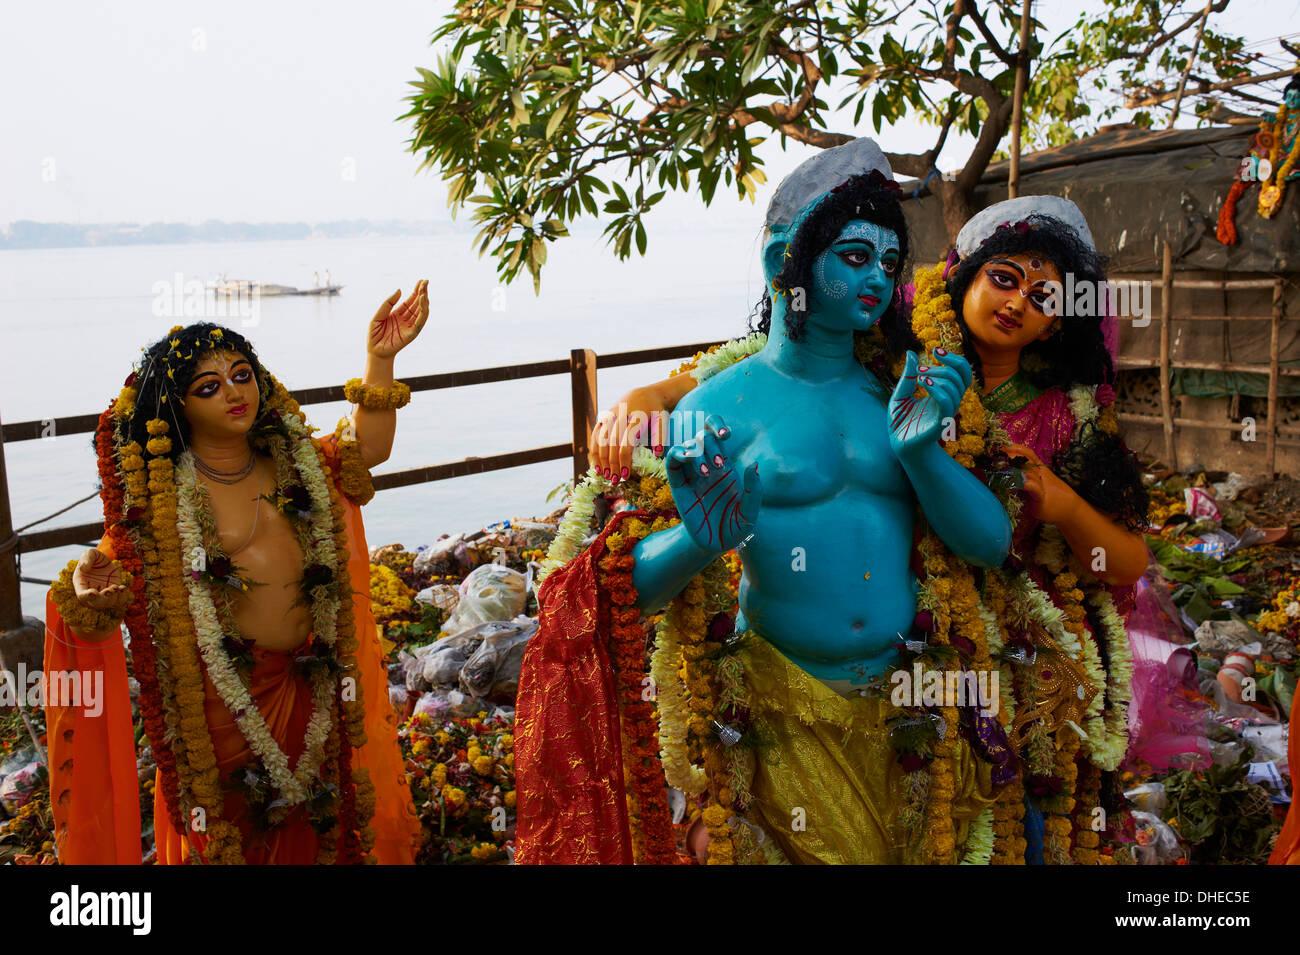 clay statues of hindu gods and goddesses kumartulli